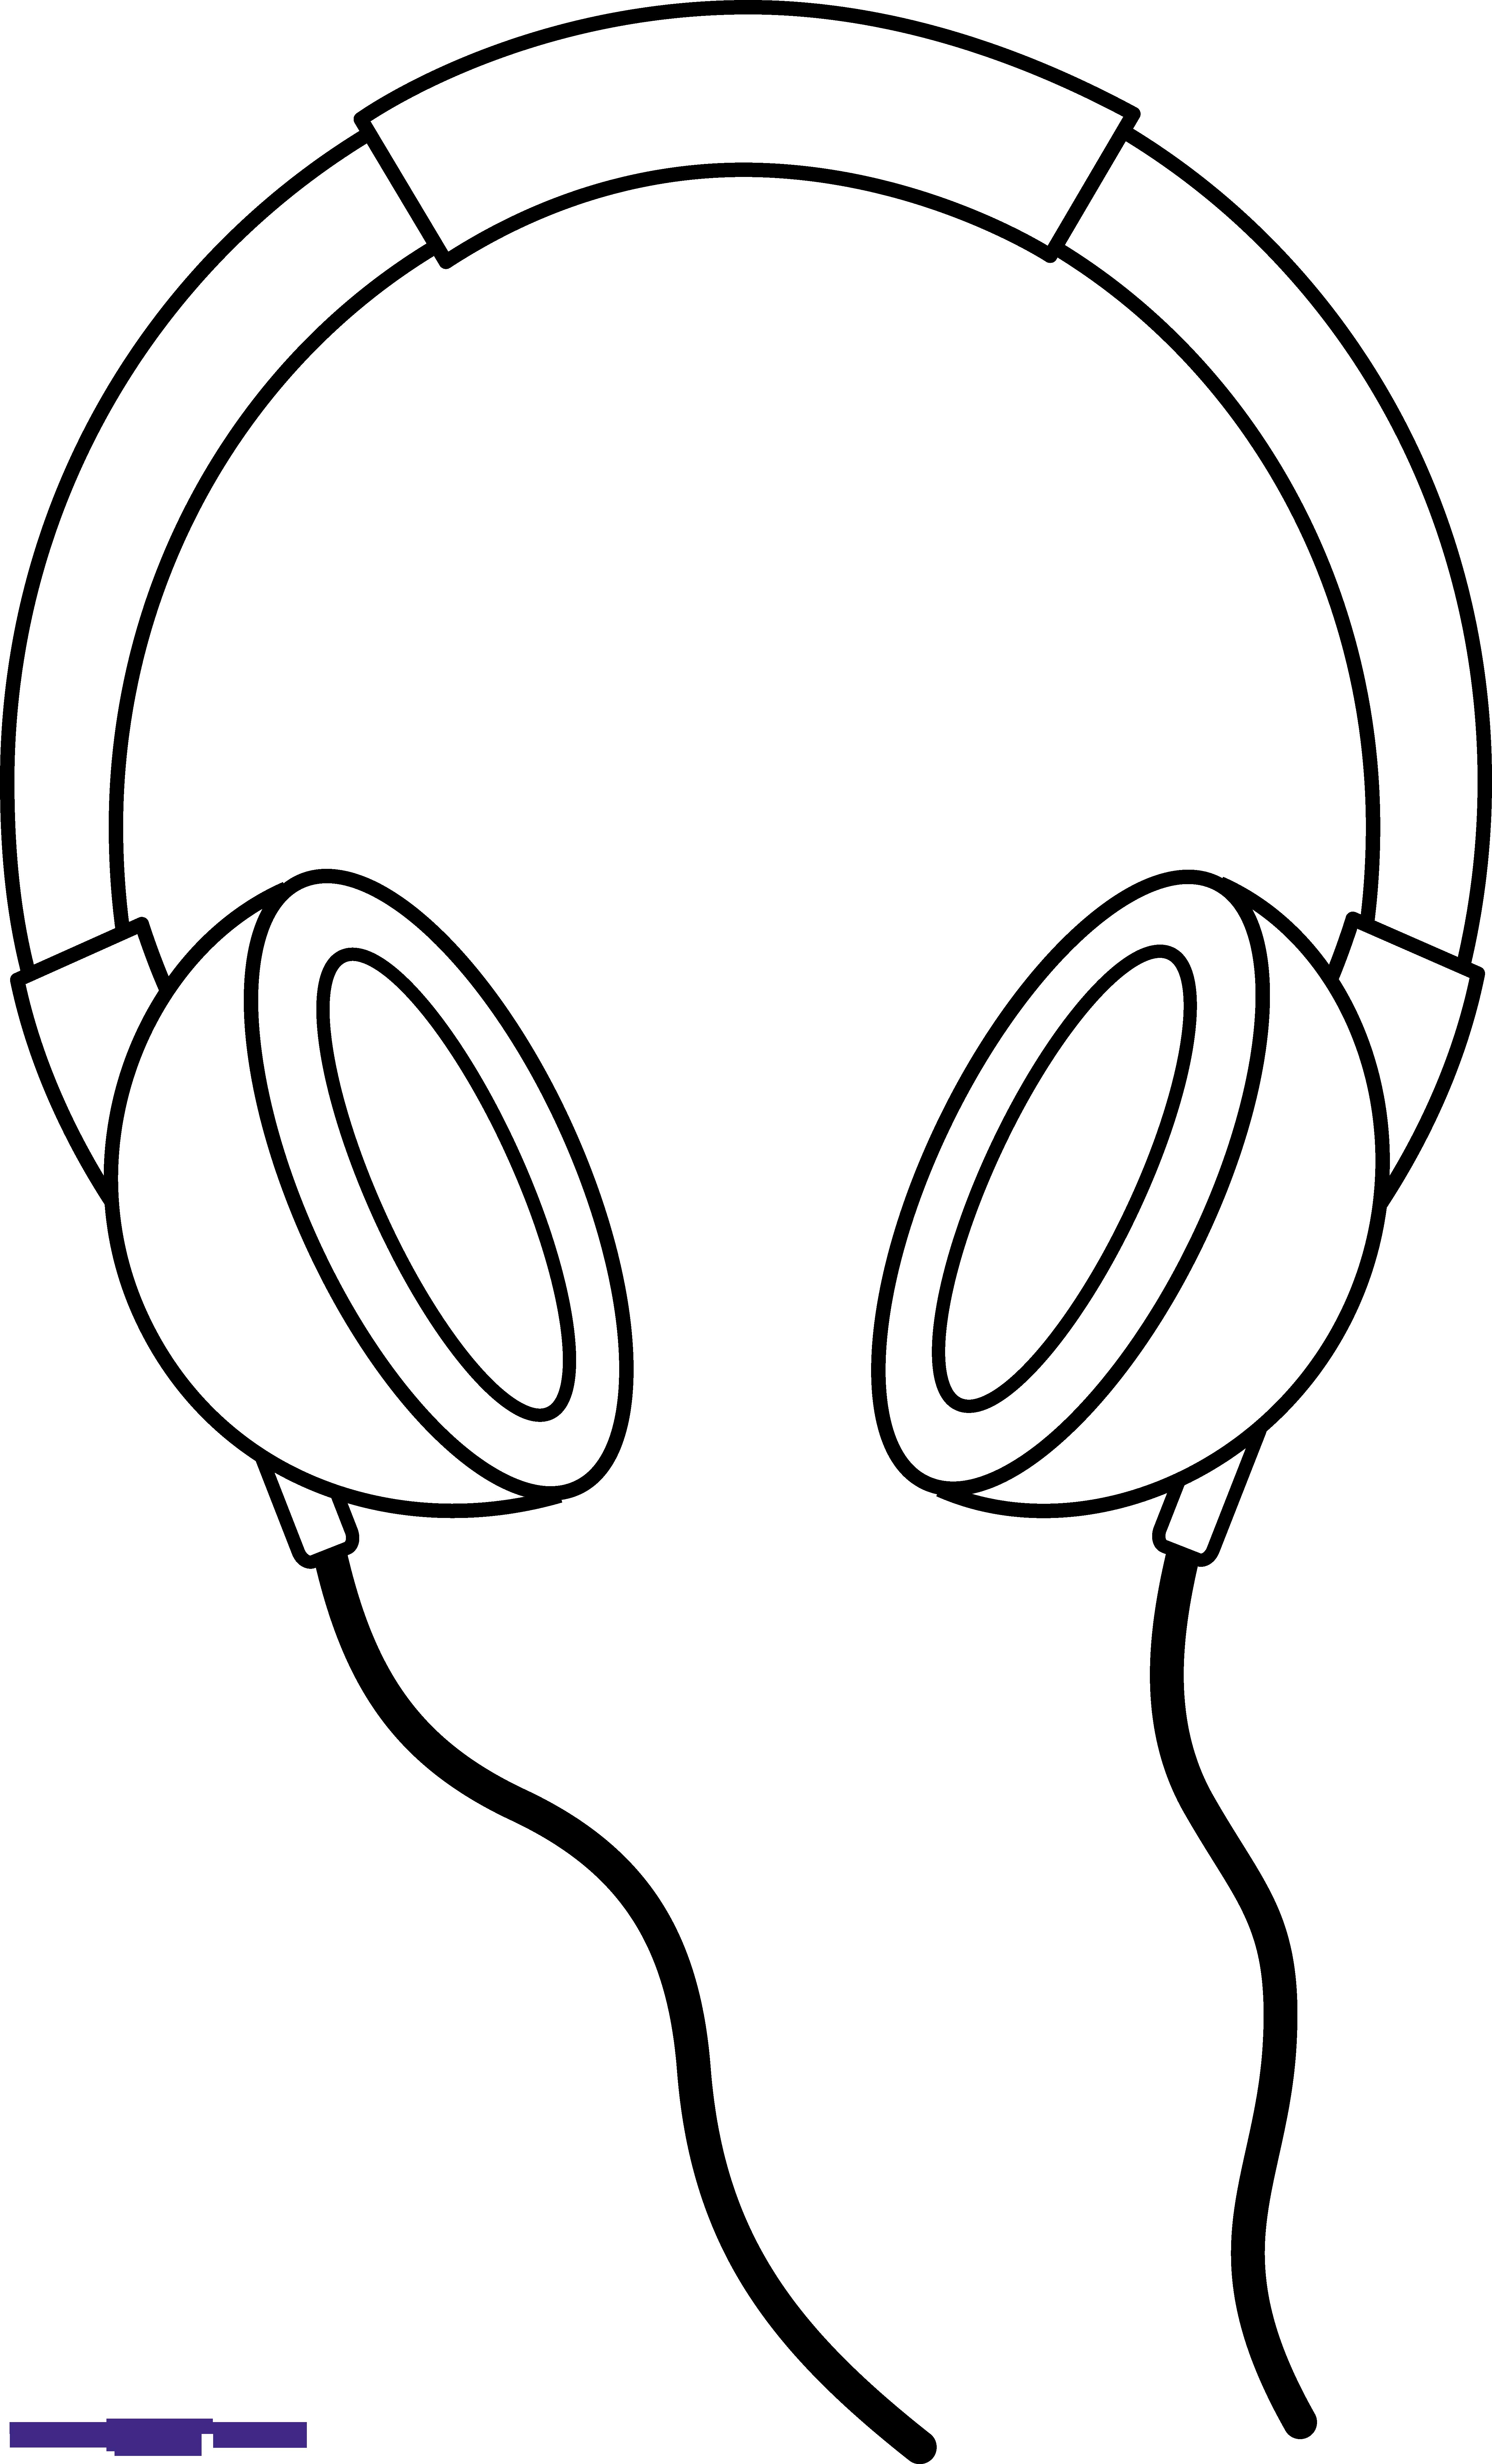 Headphone clipart black and white. Headphones line art sweet